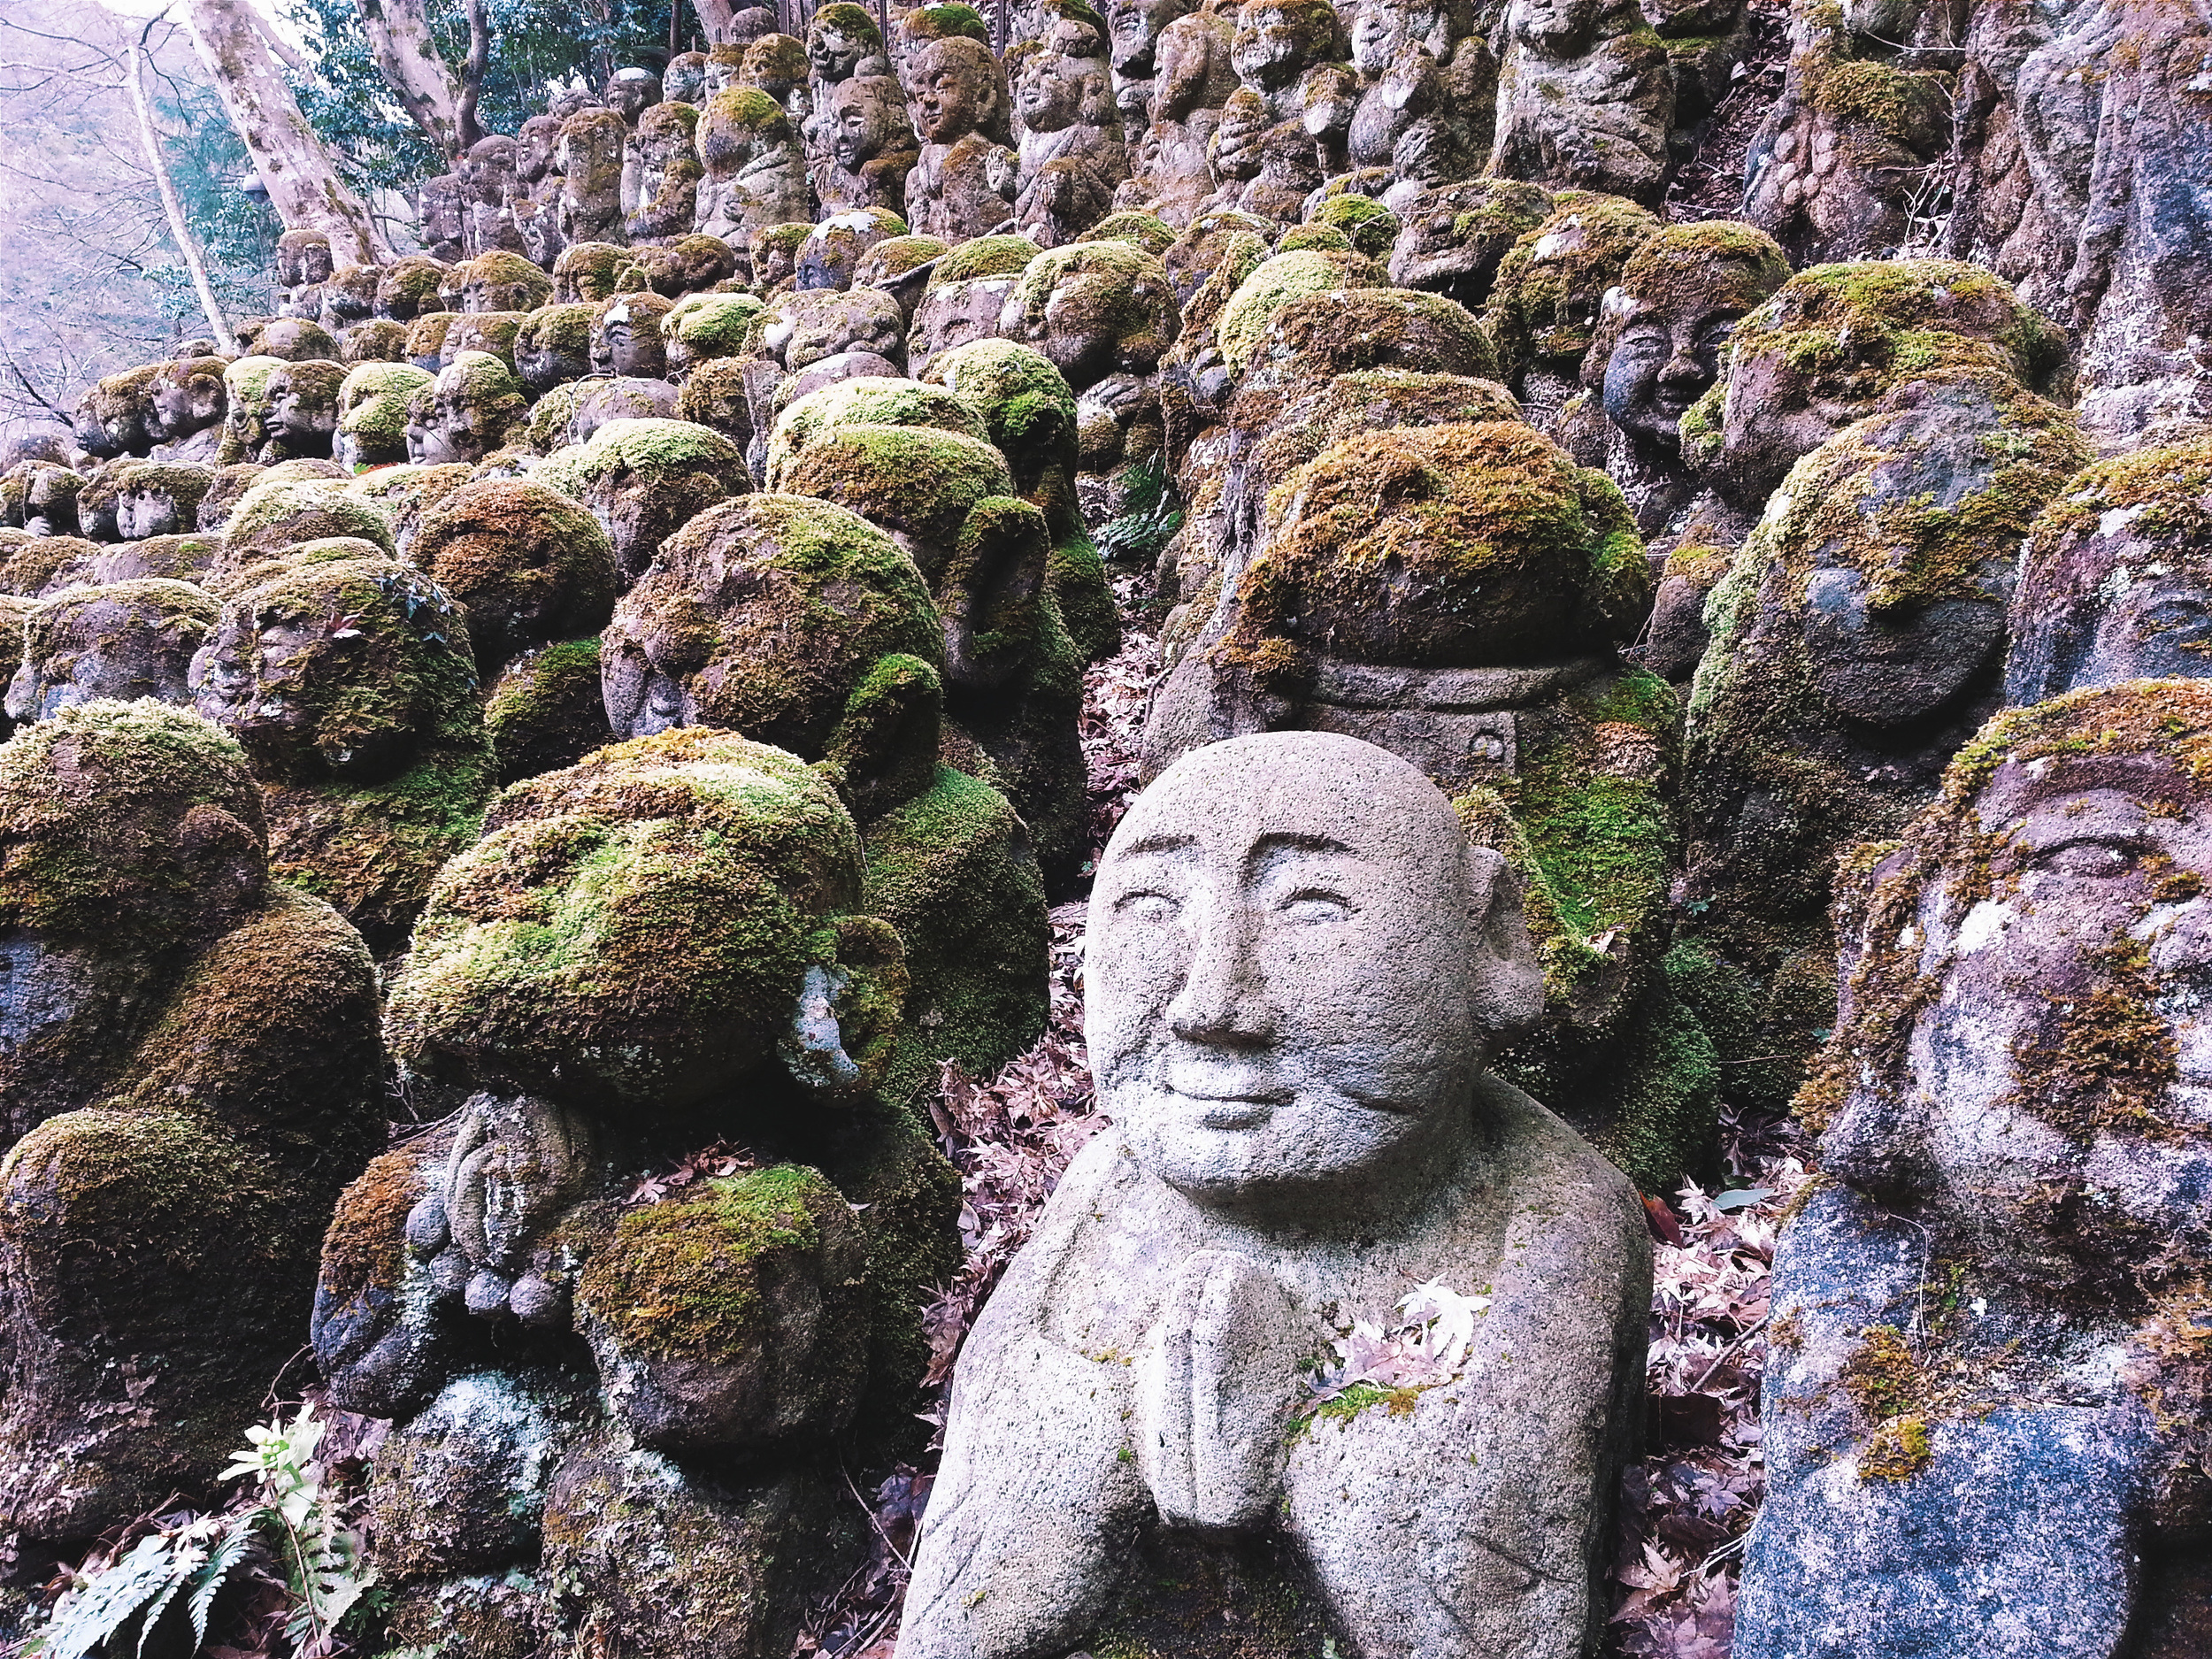 Giggled at the 1200 little statues at Otagi Nenbutsu Ji Temple in Arasshiyama  Cost: 300 yen / $2.50 per person